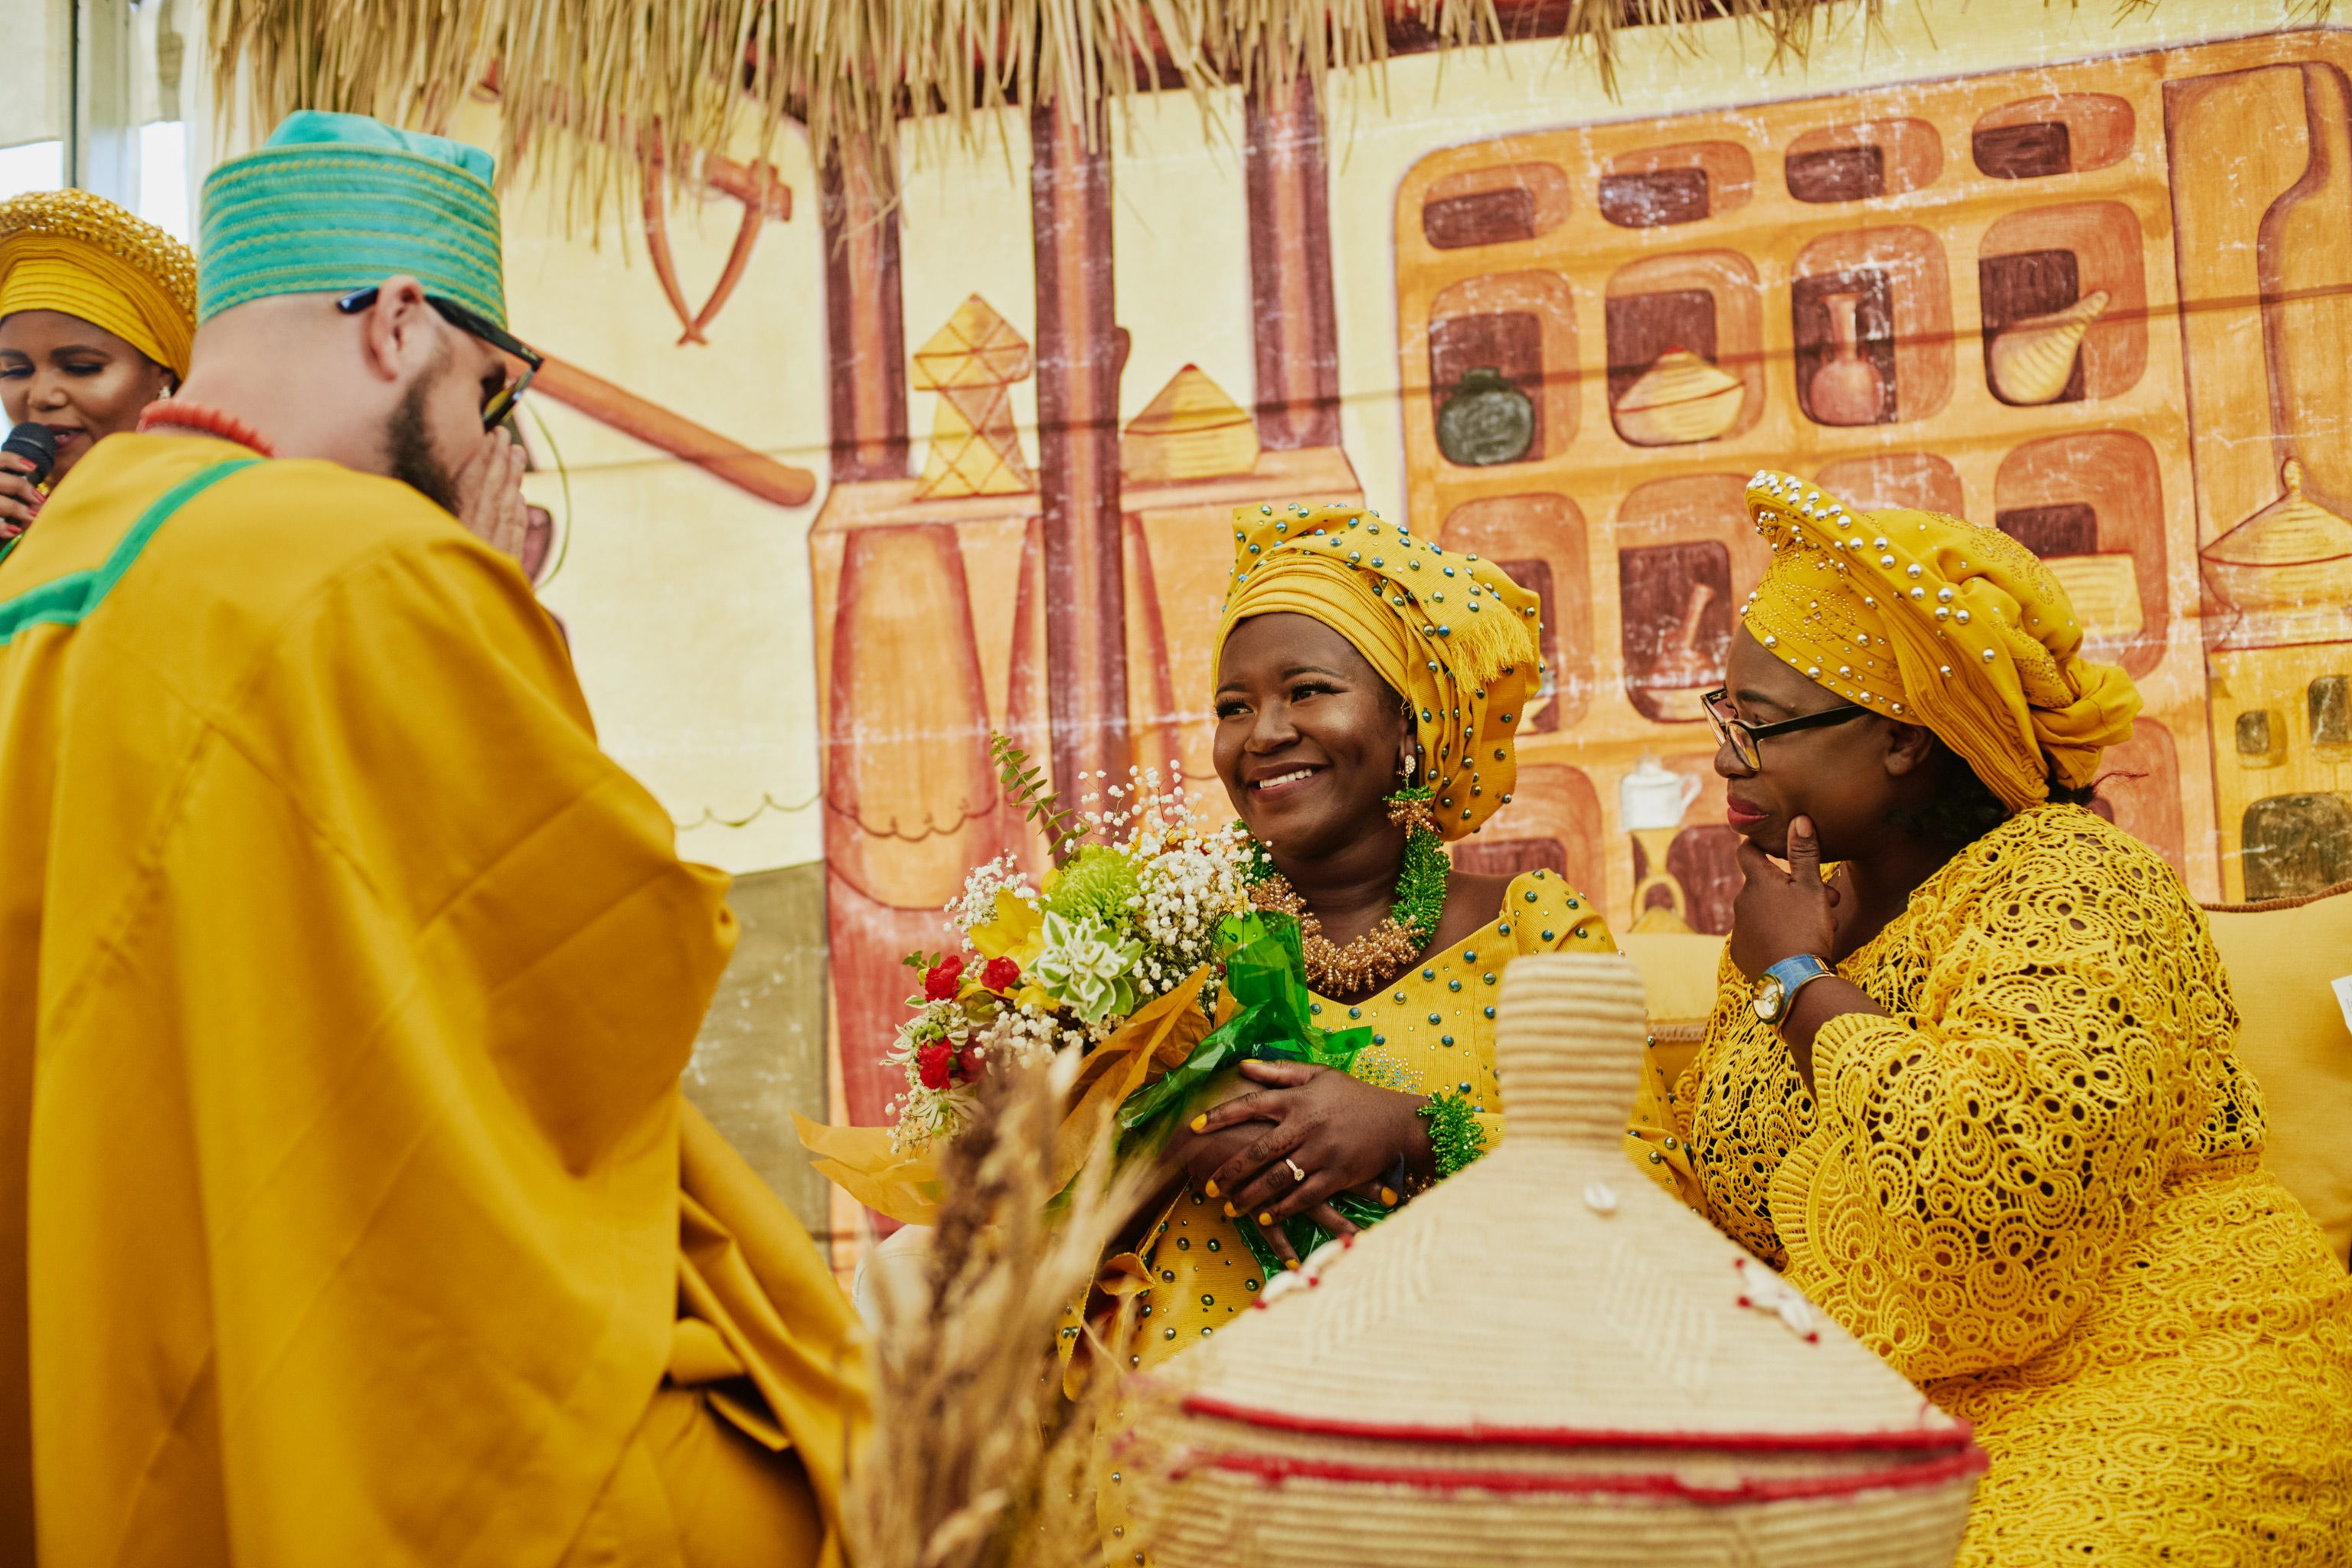 African bridal shower african wedding cakes wedding